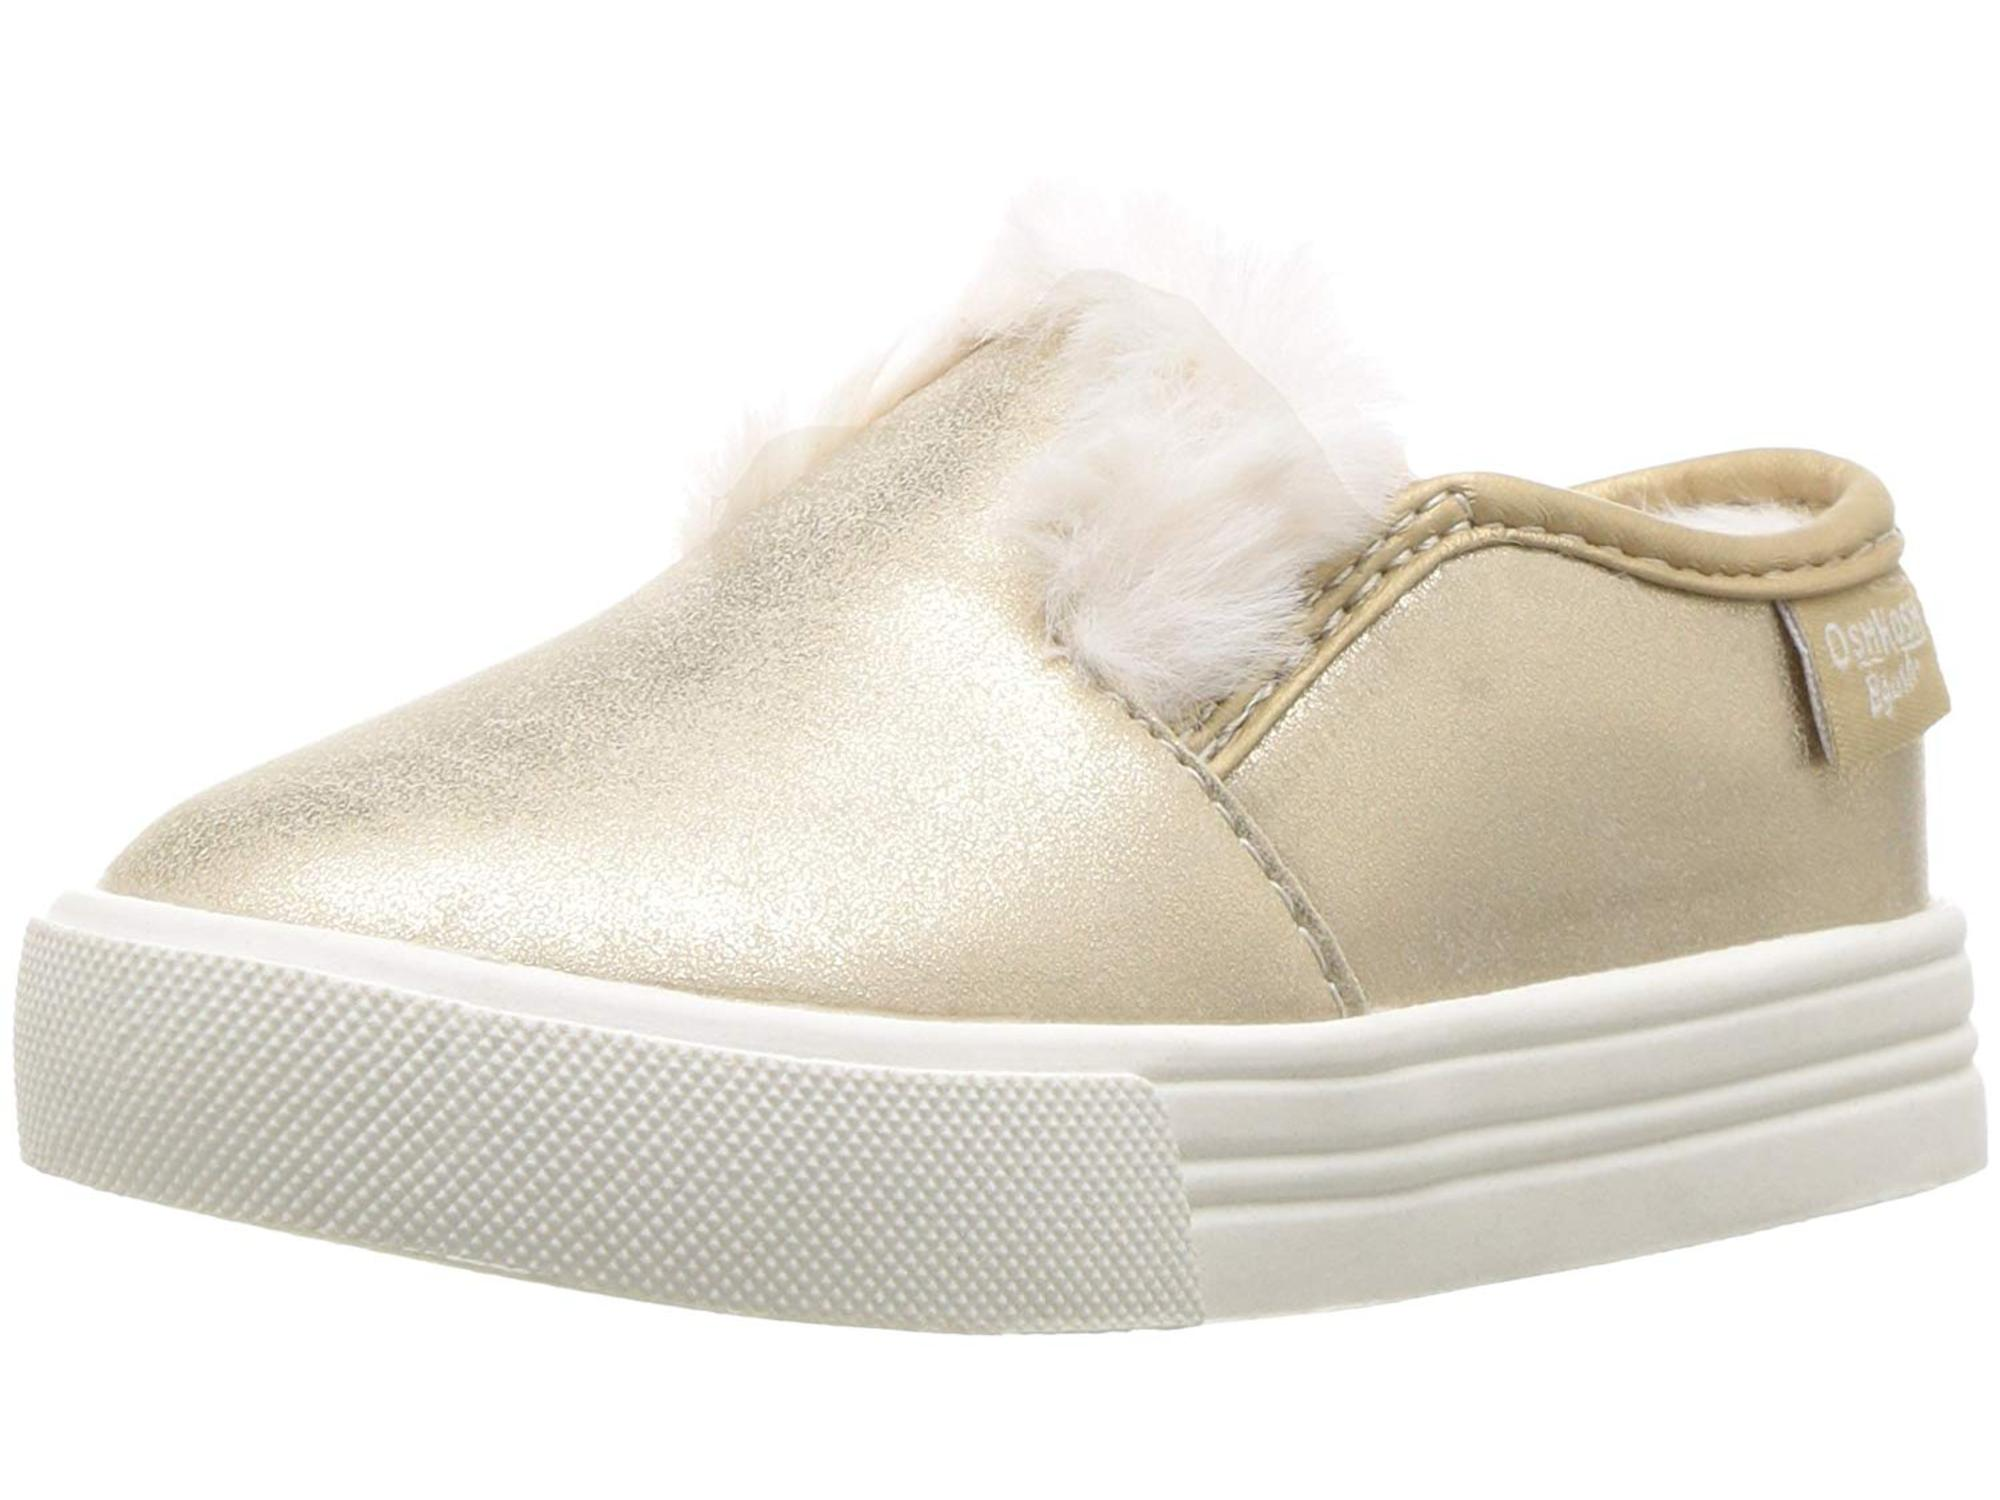 XINBONG Boys Girls Anti-Slip Bath Slippers Bathroom Slippers Shower Shoes Gym Slippers Little Kid//Big Kid